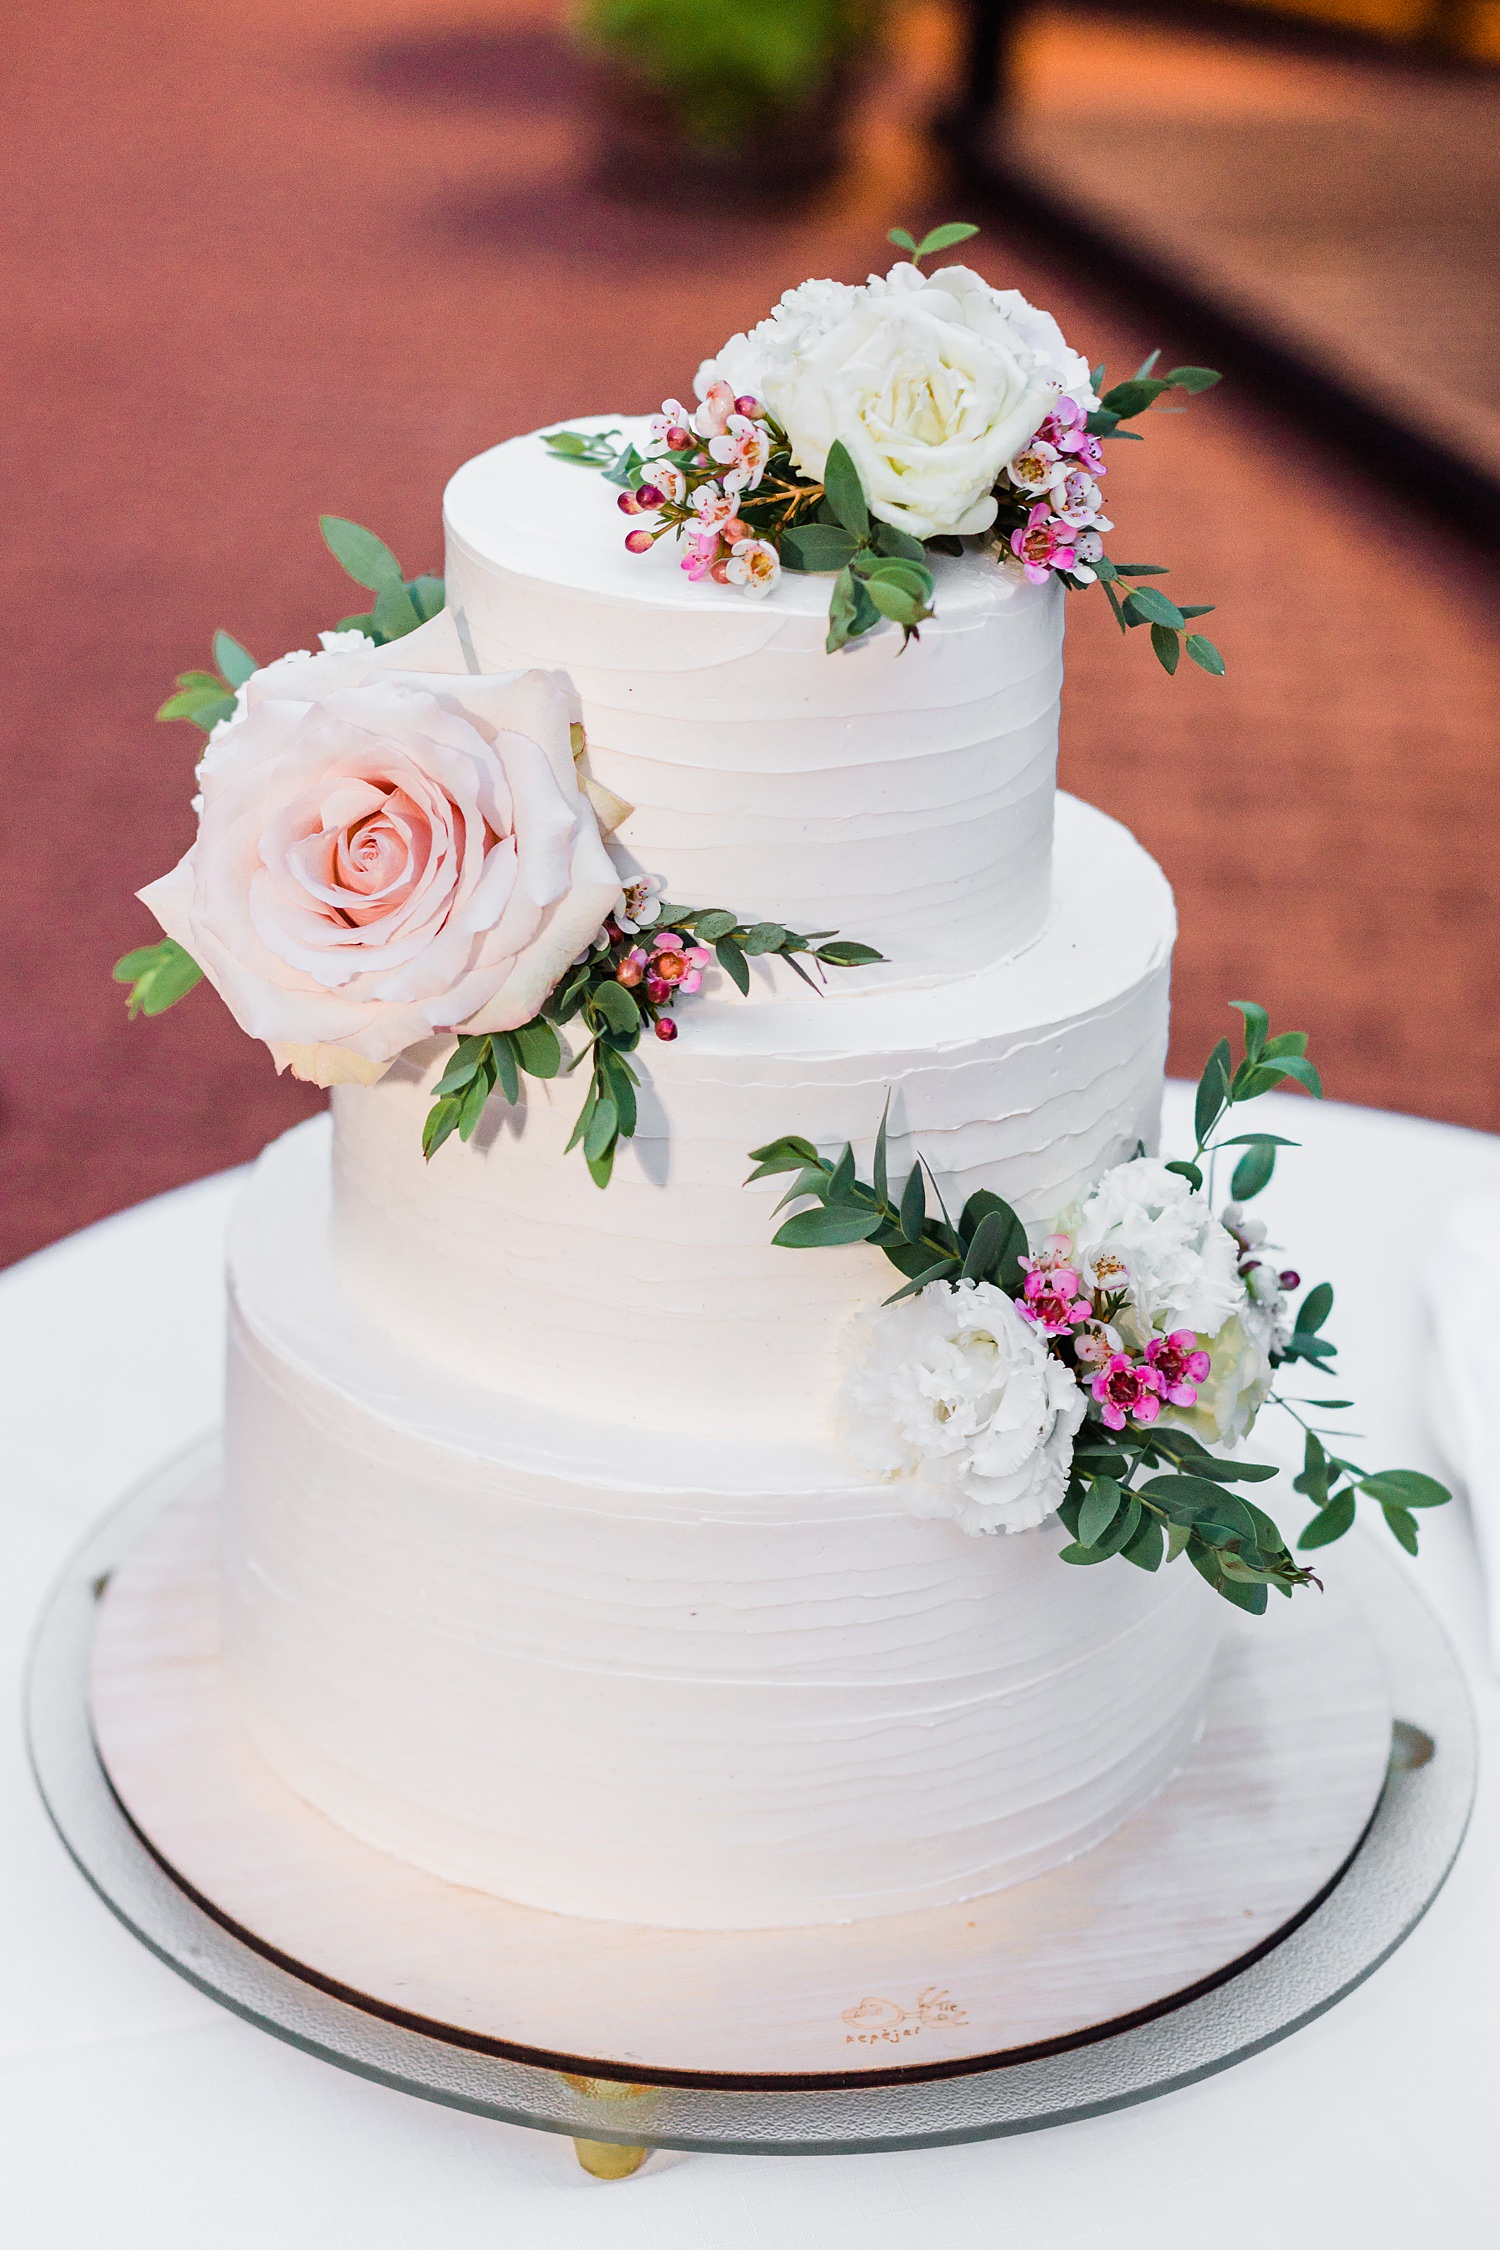 Three tiered cake with roses - photo by Jurgita Lukos Photography